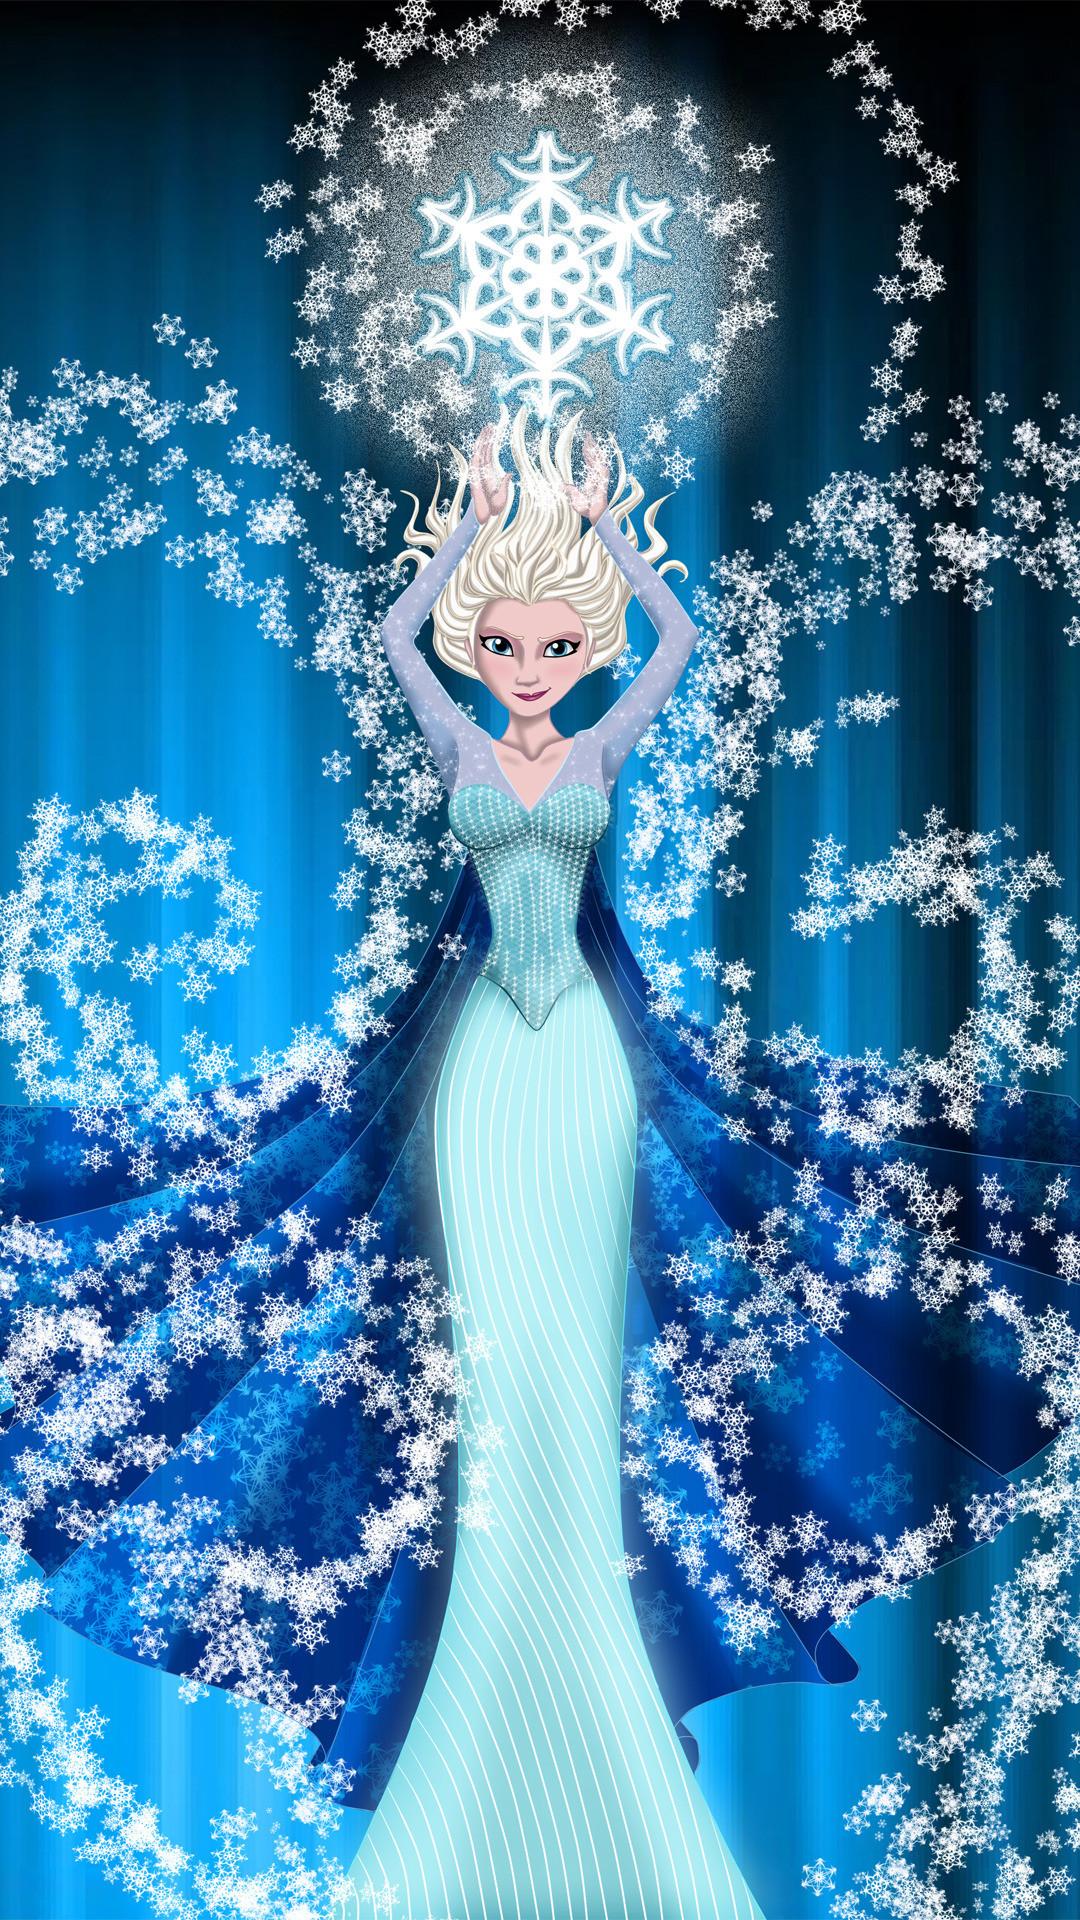 Frozen Elsa Expressions Wallpaper   HD Wallpaper Collection   HD 1080x1920